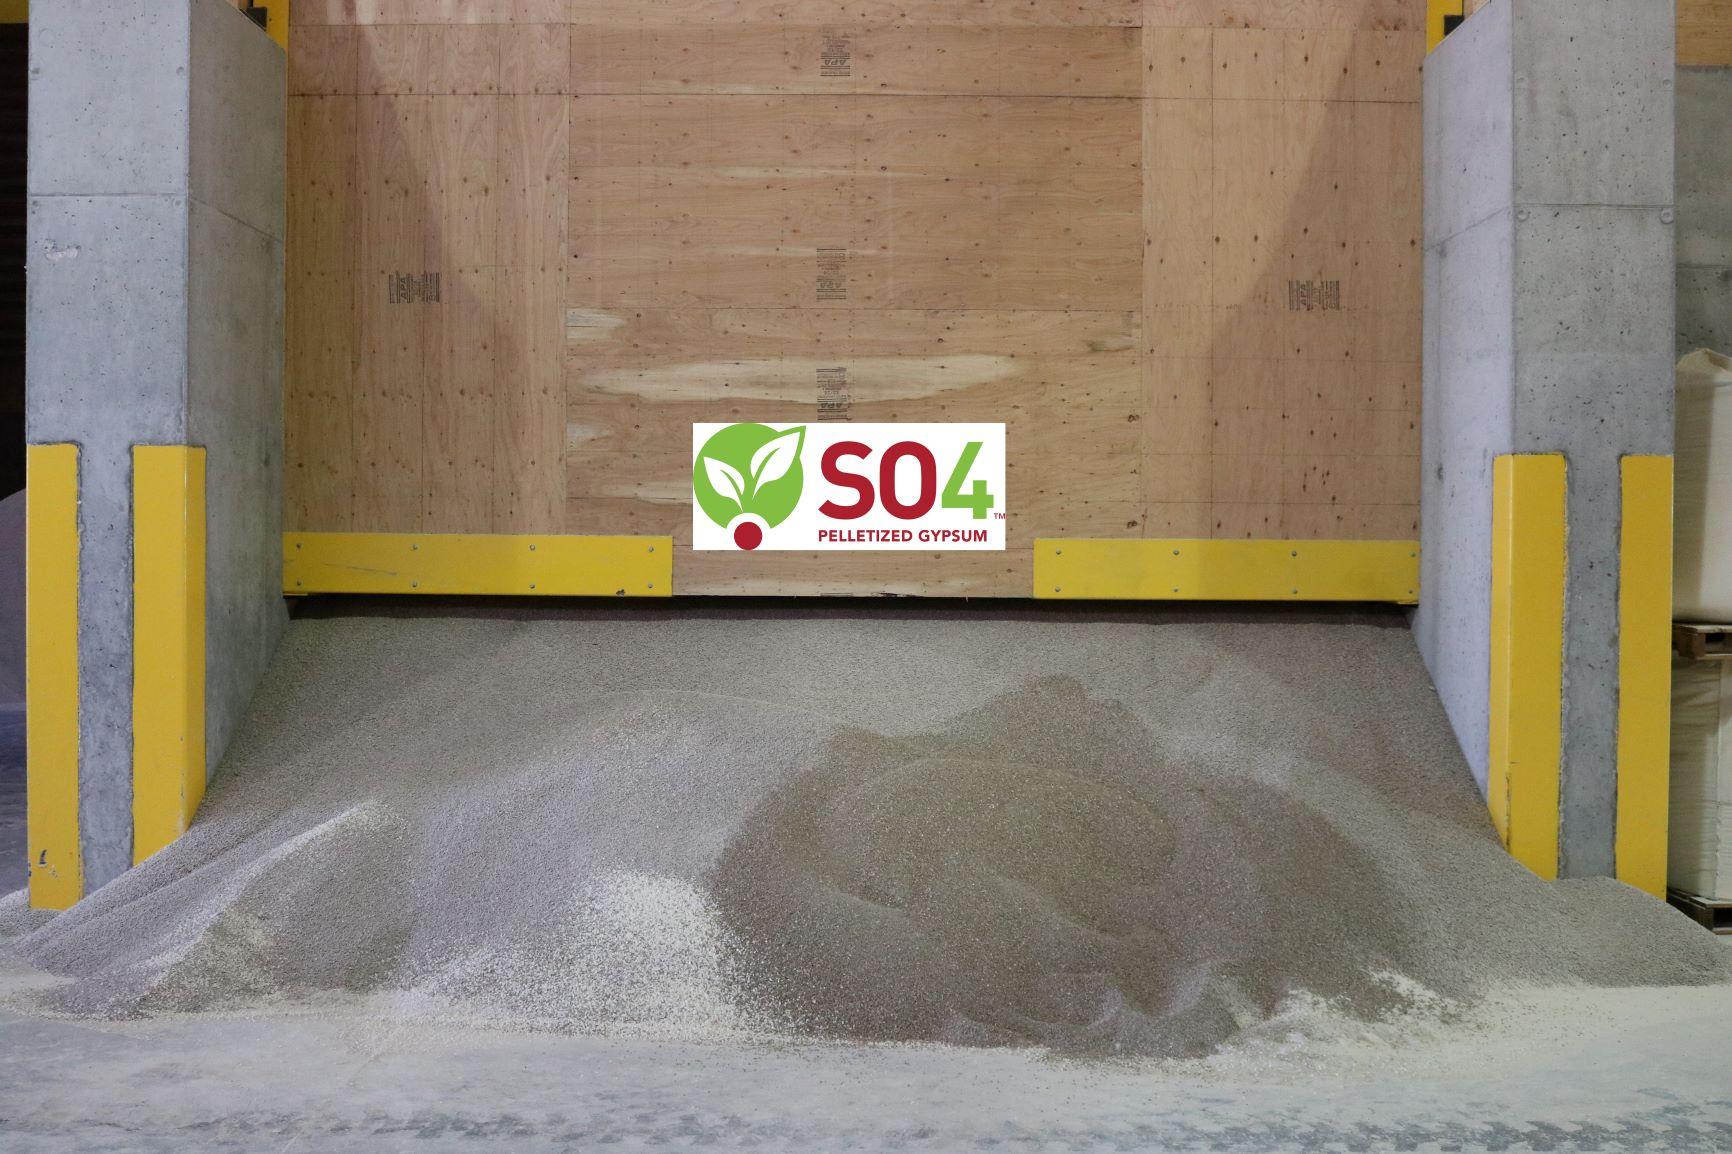 SO4 in a Dry Fertilizer